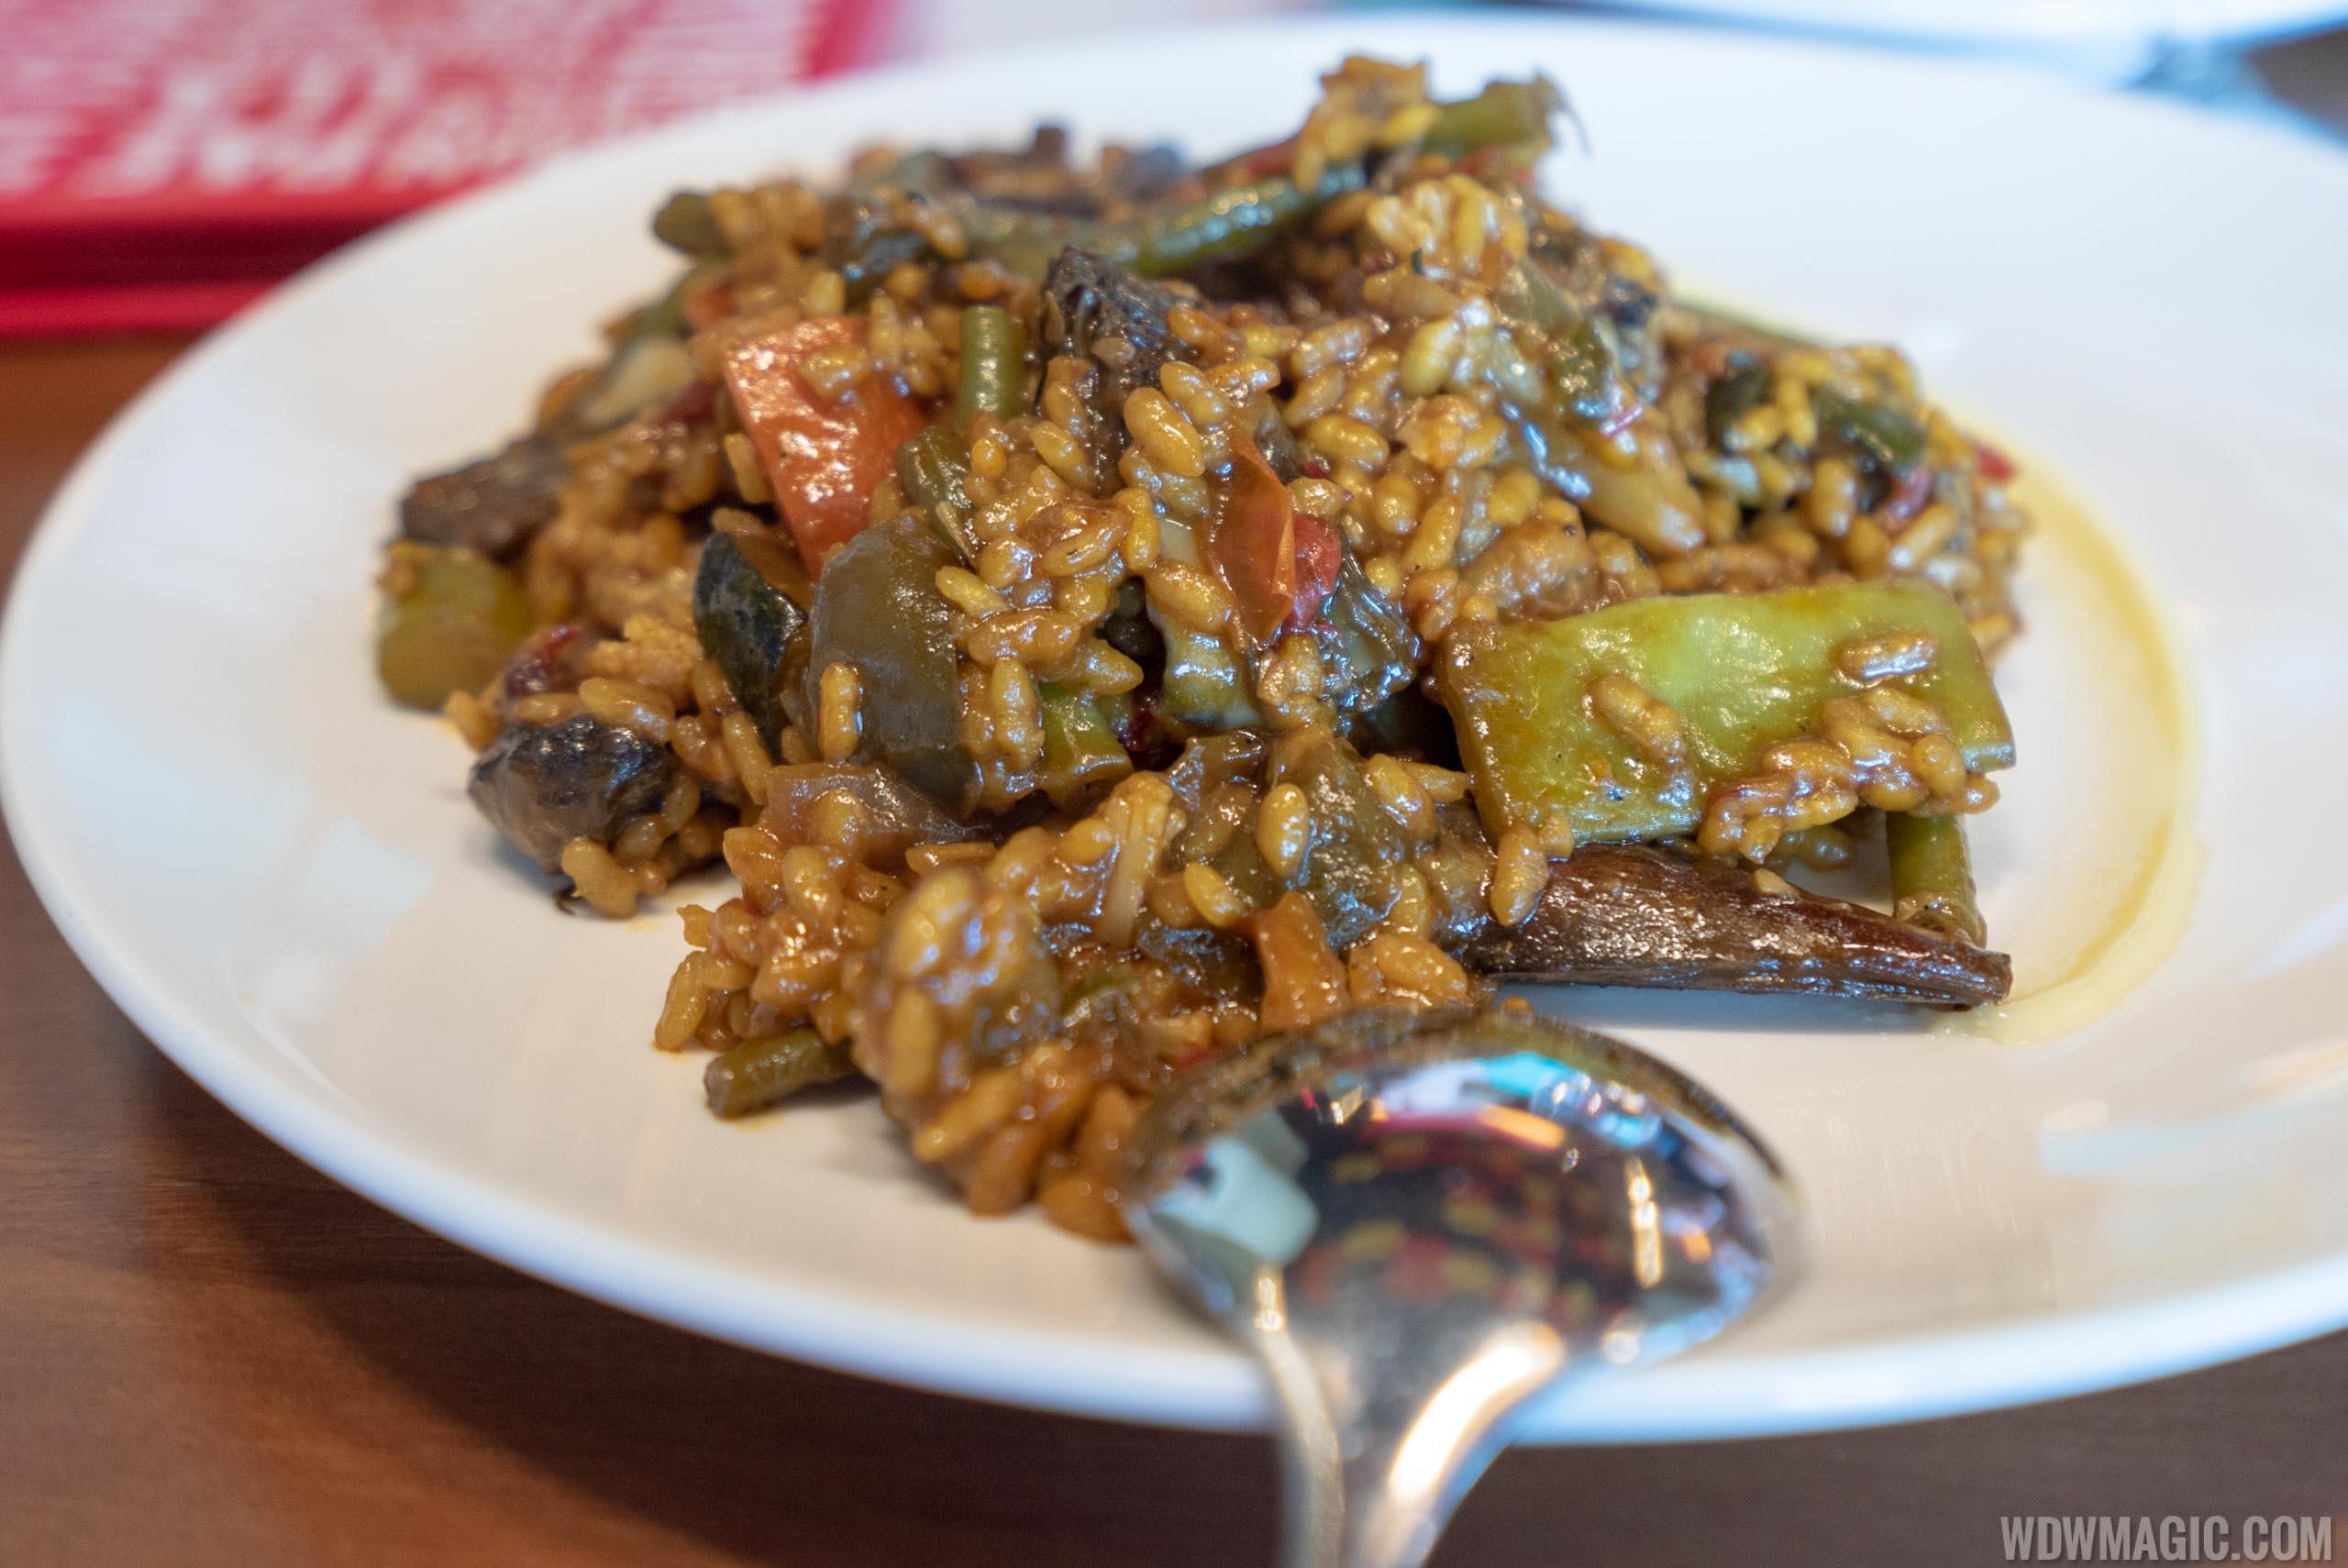 Chef's tasting menu: José's Way - A traditional paella of seasonal vegetables and mushrooms